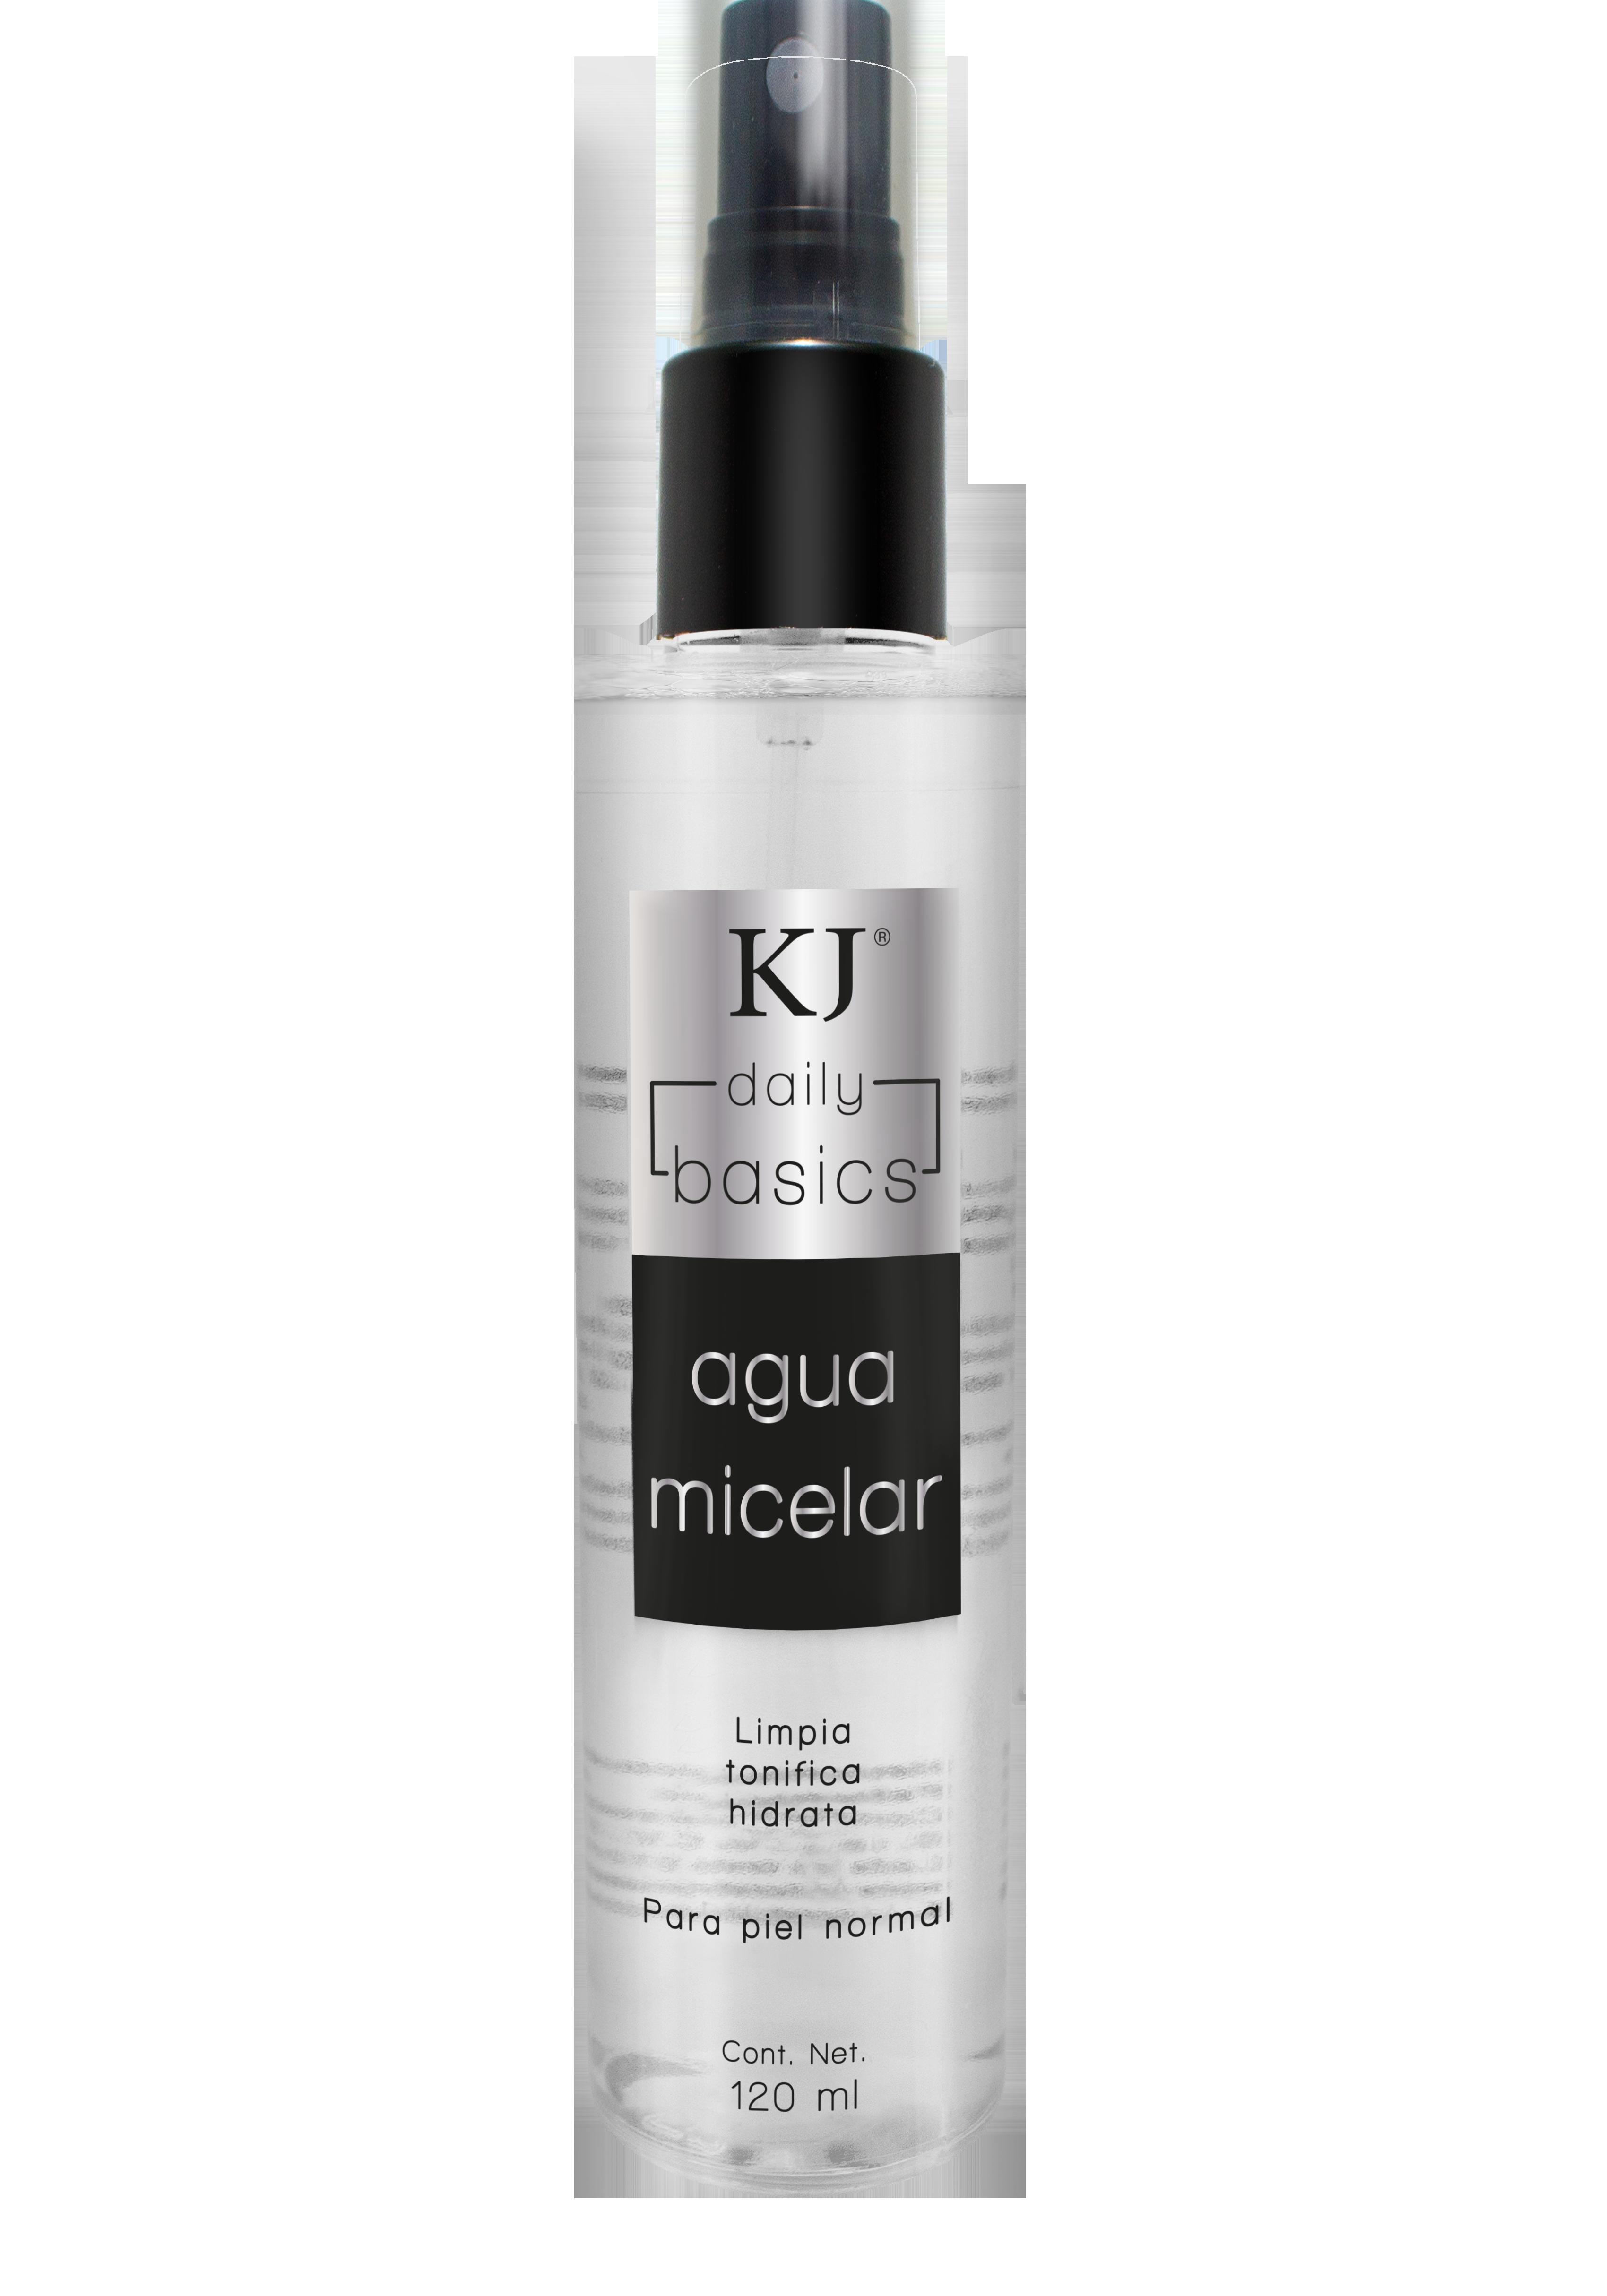 Agua Micelar KJ Basics Desmaquillante 7506289930647